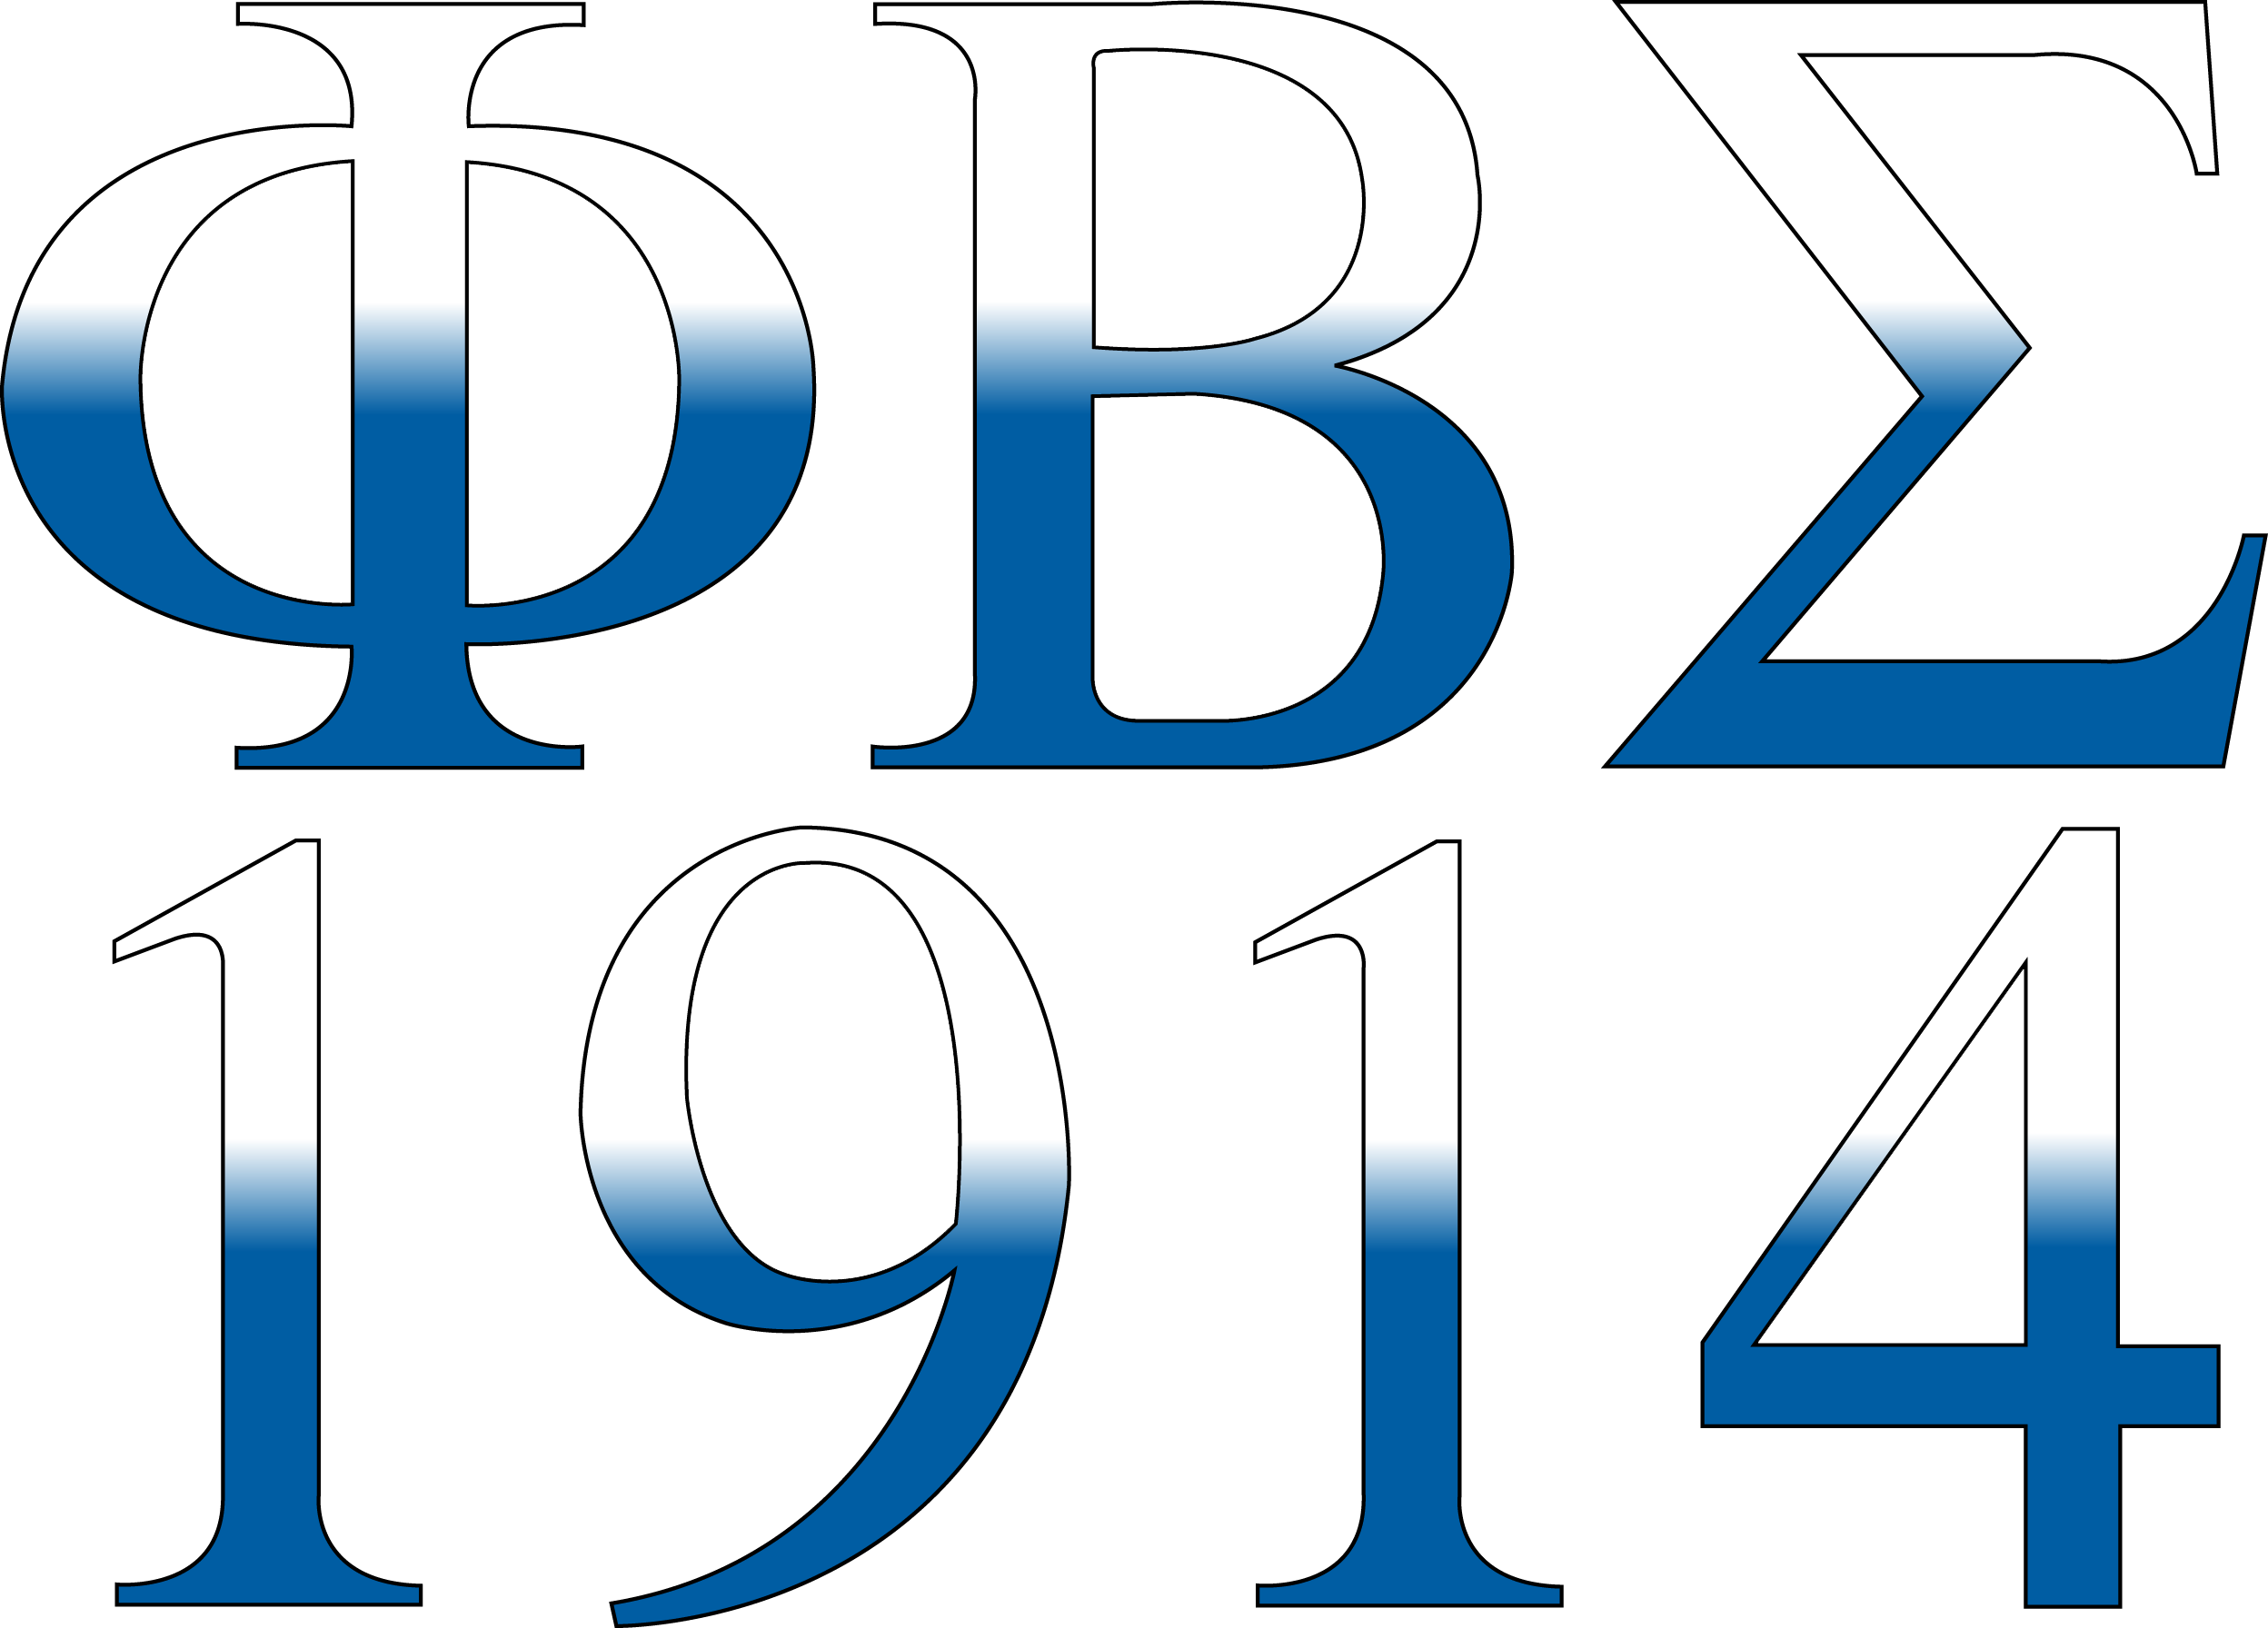 Beta sigma phi clip art 2015 clip Phi Beta Sigma Logo free image clip